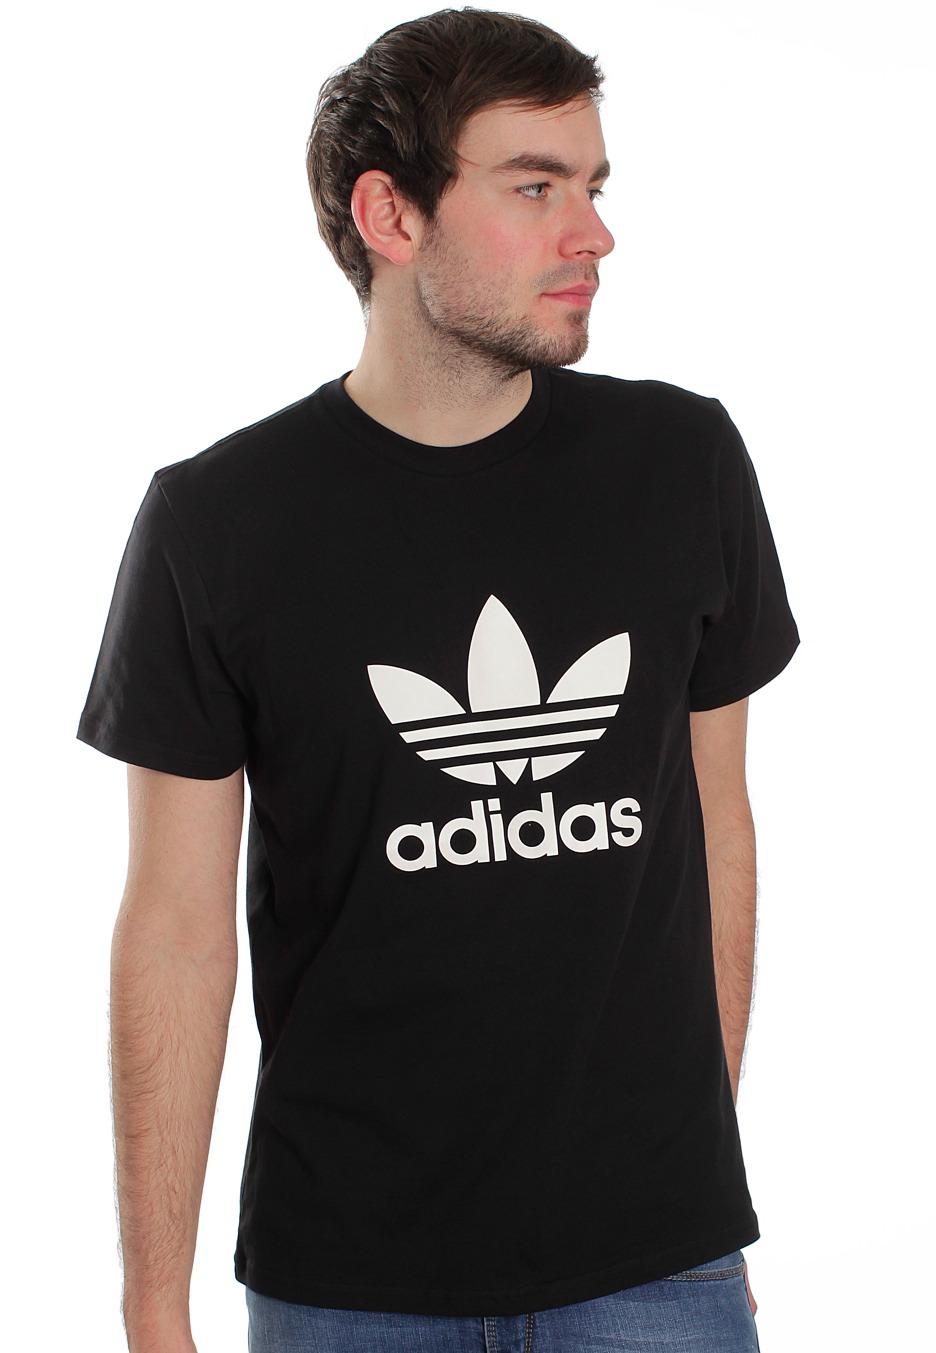 adidas t-shirt trefoil